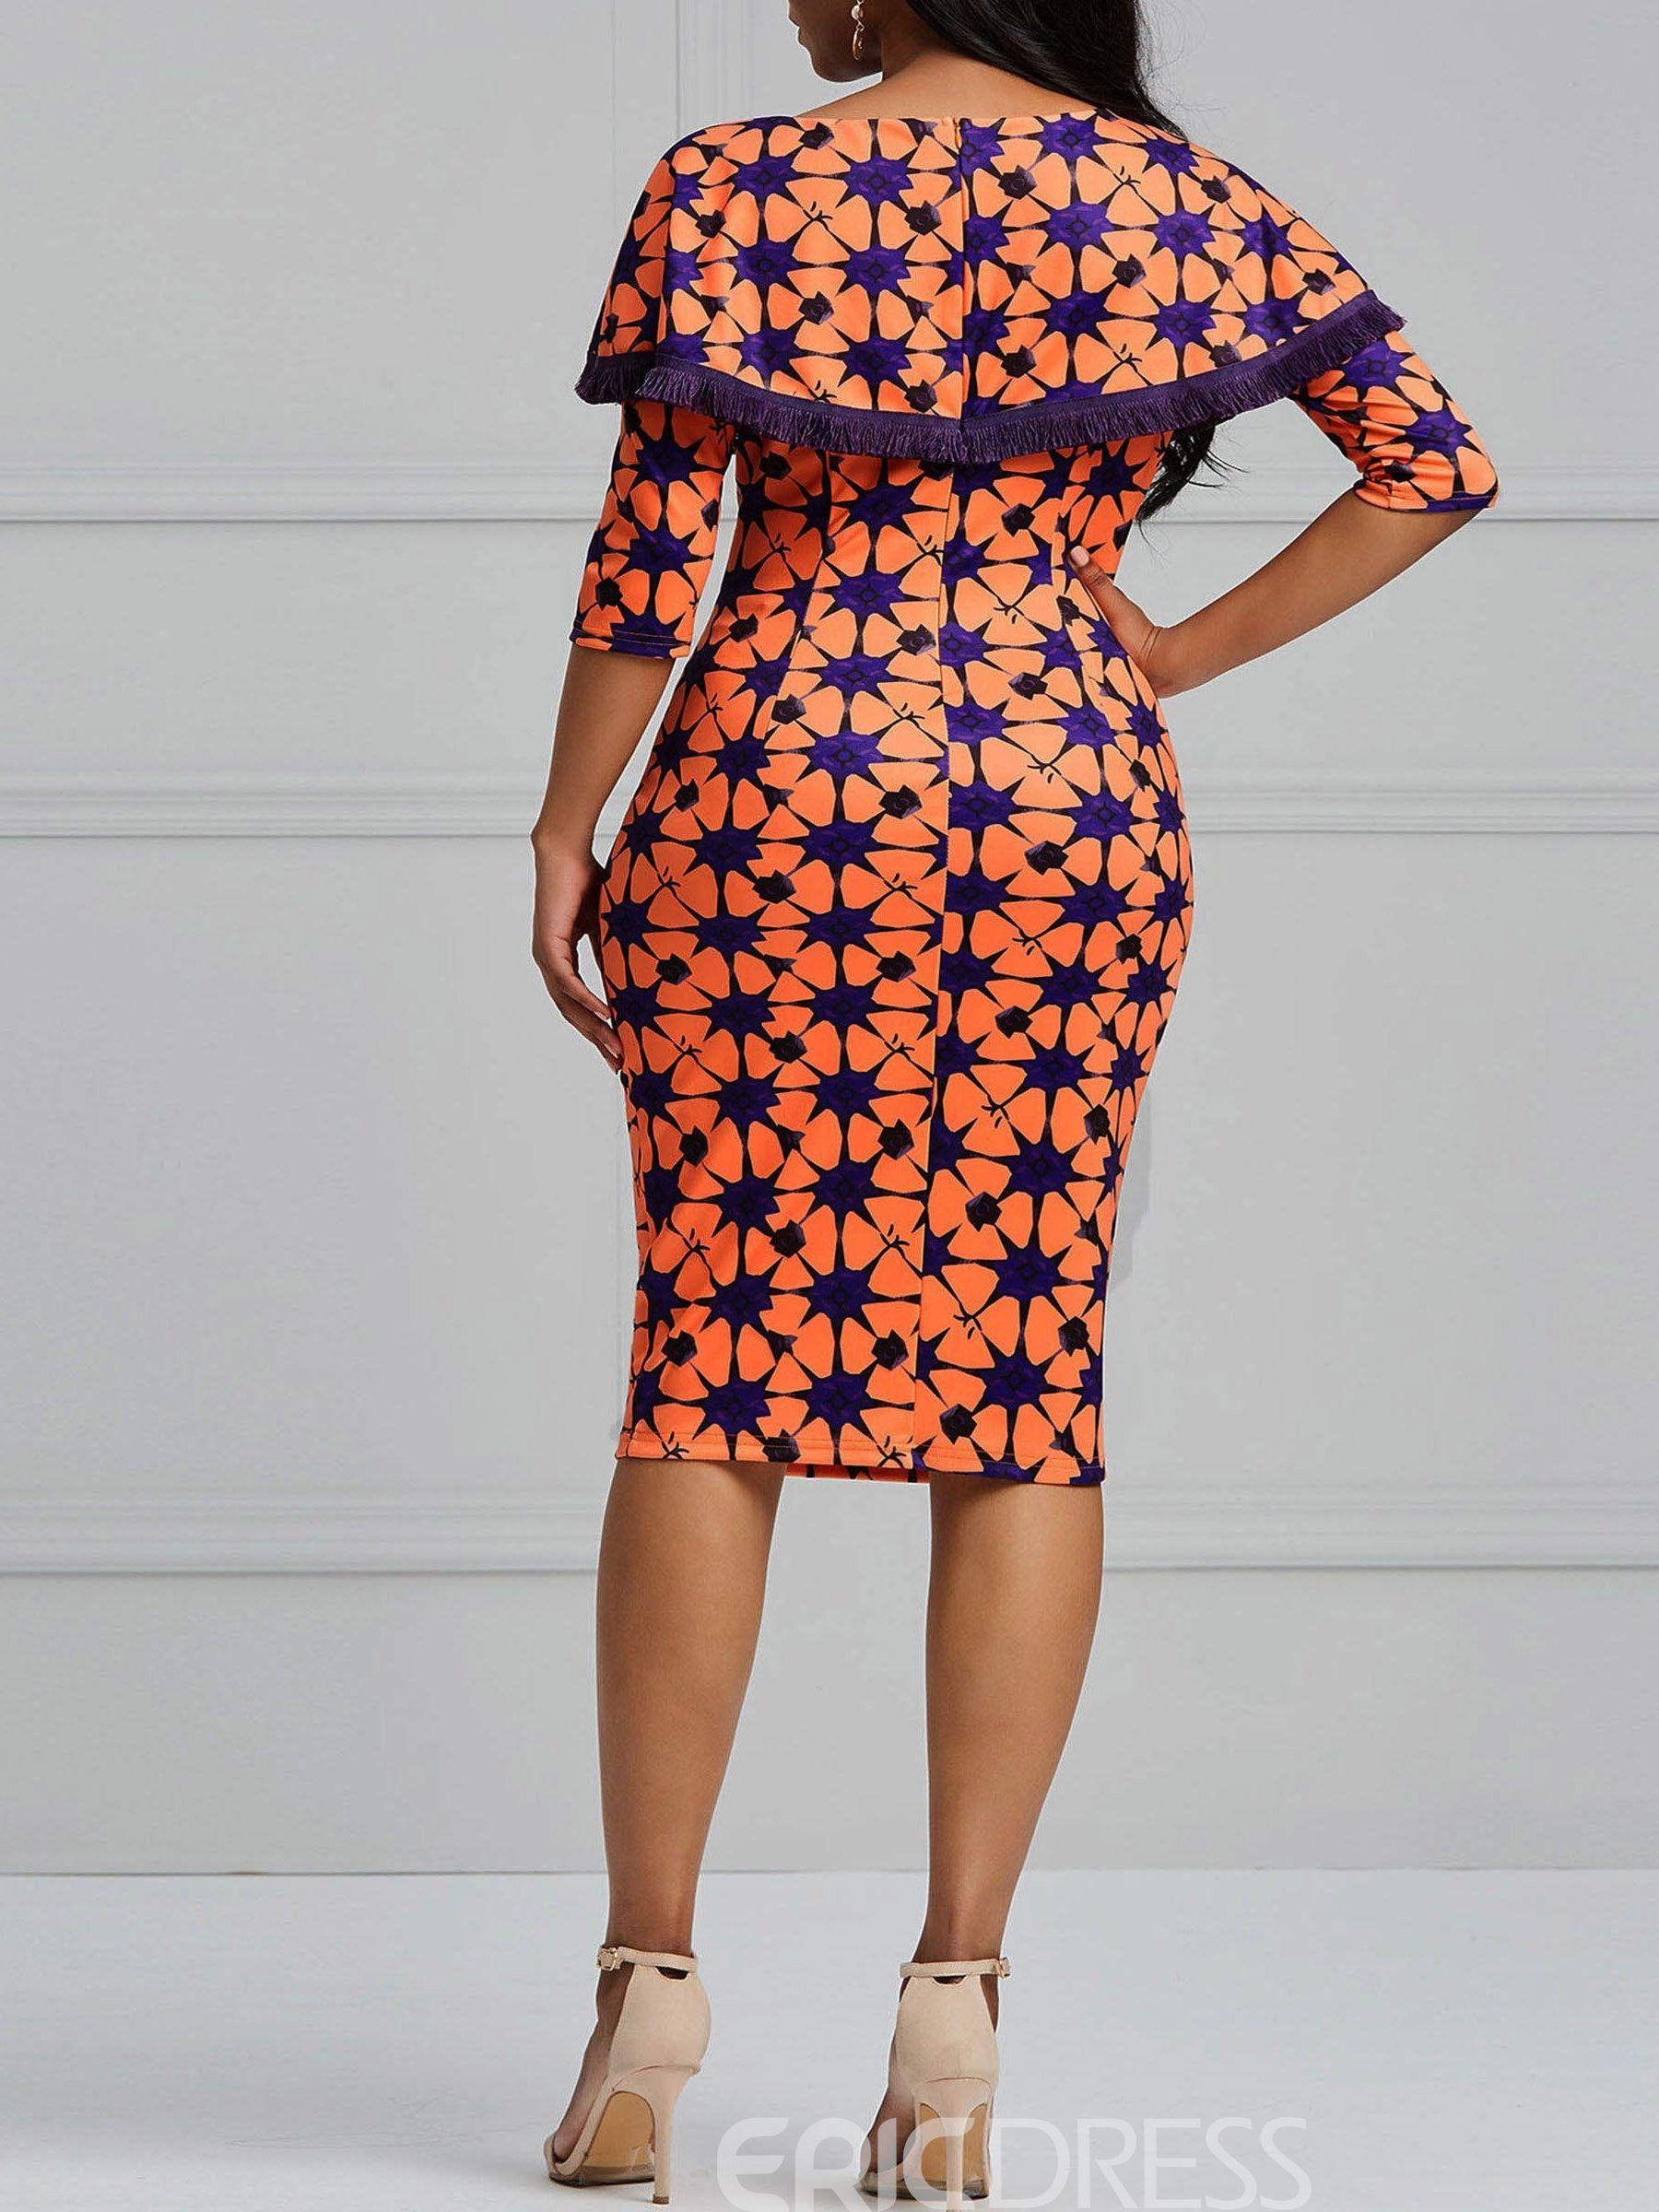 c47d3cfe5 Ericdress Bodycon Geometric Print Women's Dress | African dress in ...